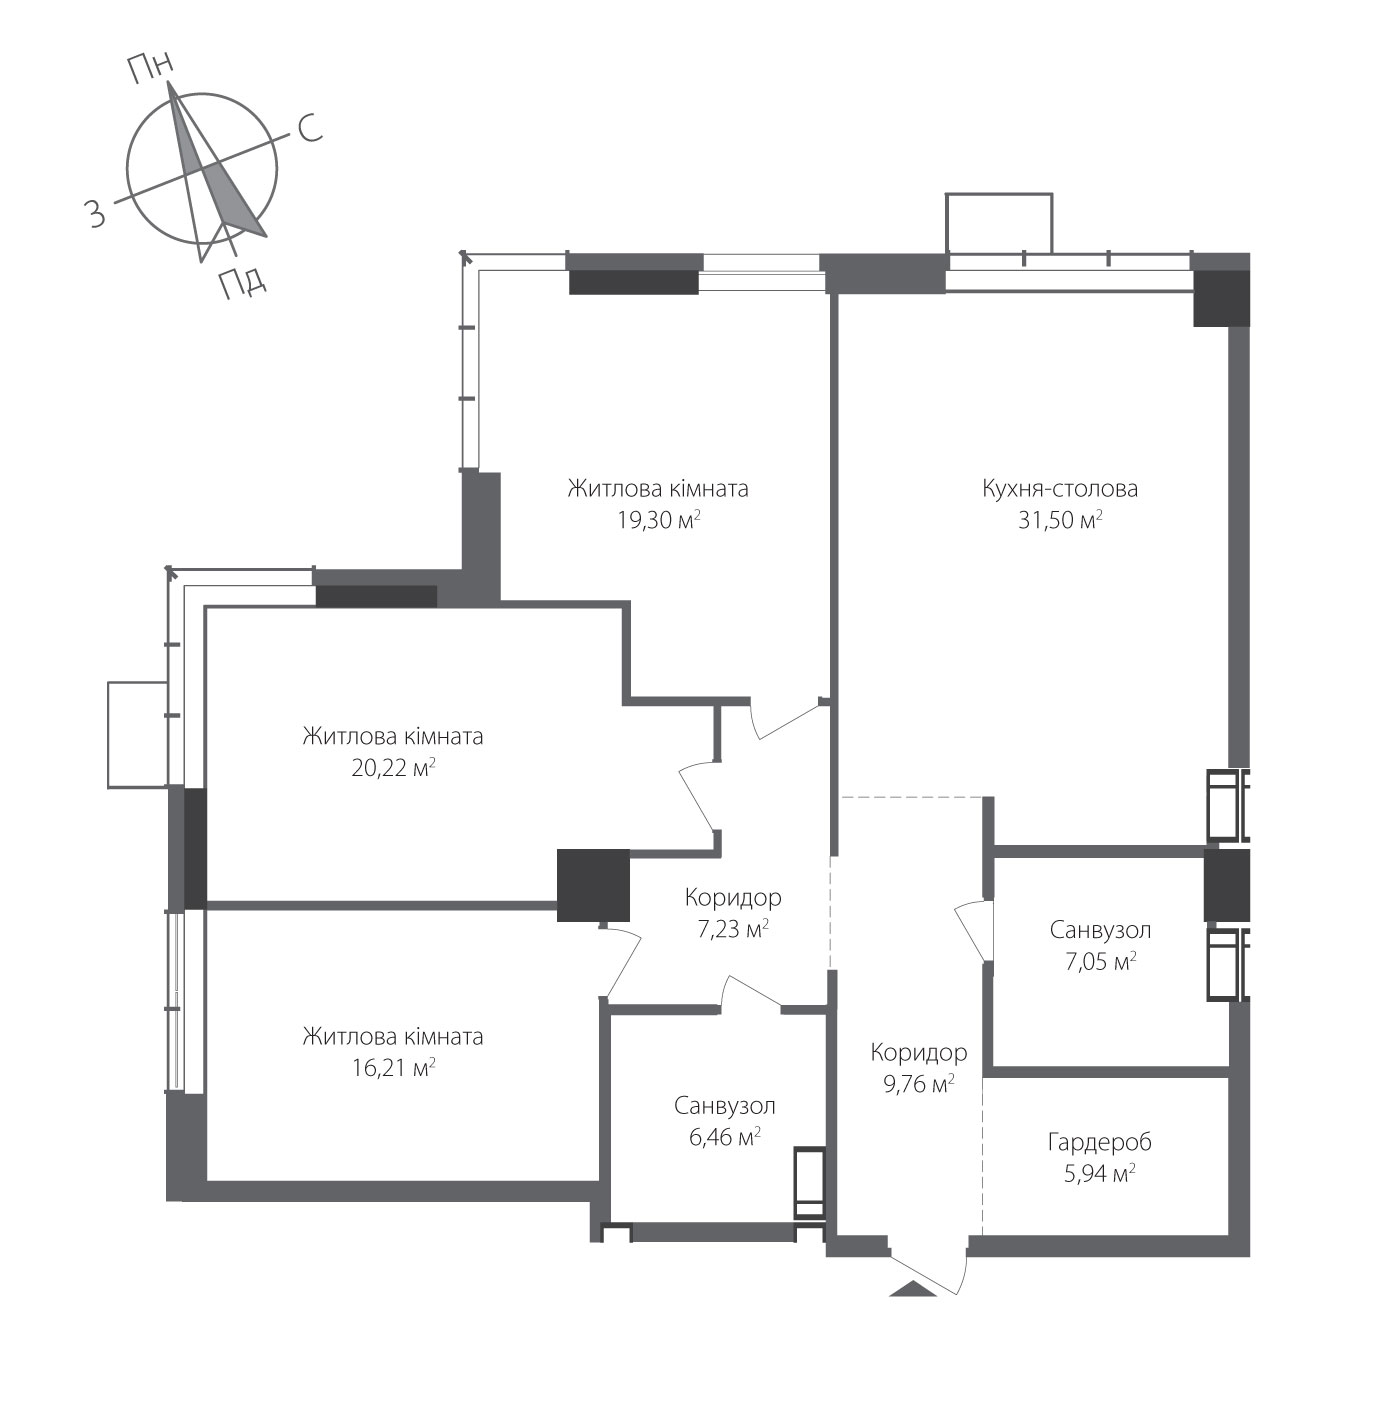 Номер квартири №0706, Будинок 8, Поверх 7, Повна площа 123,66